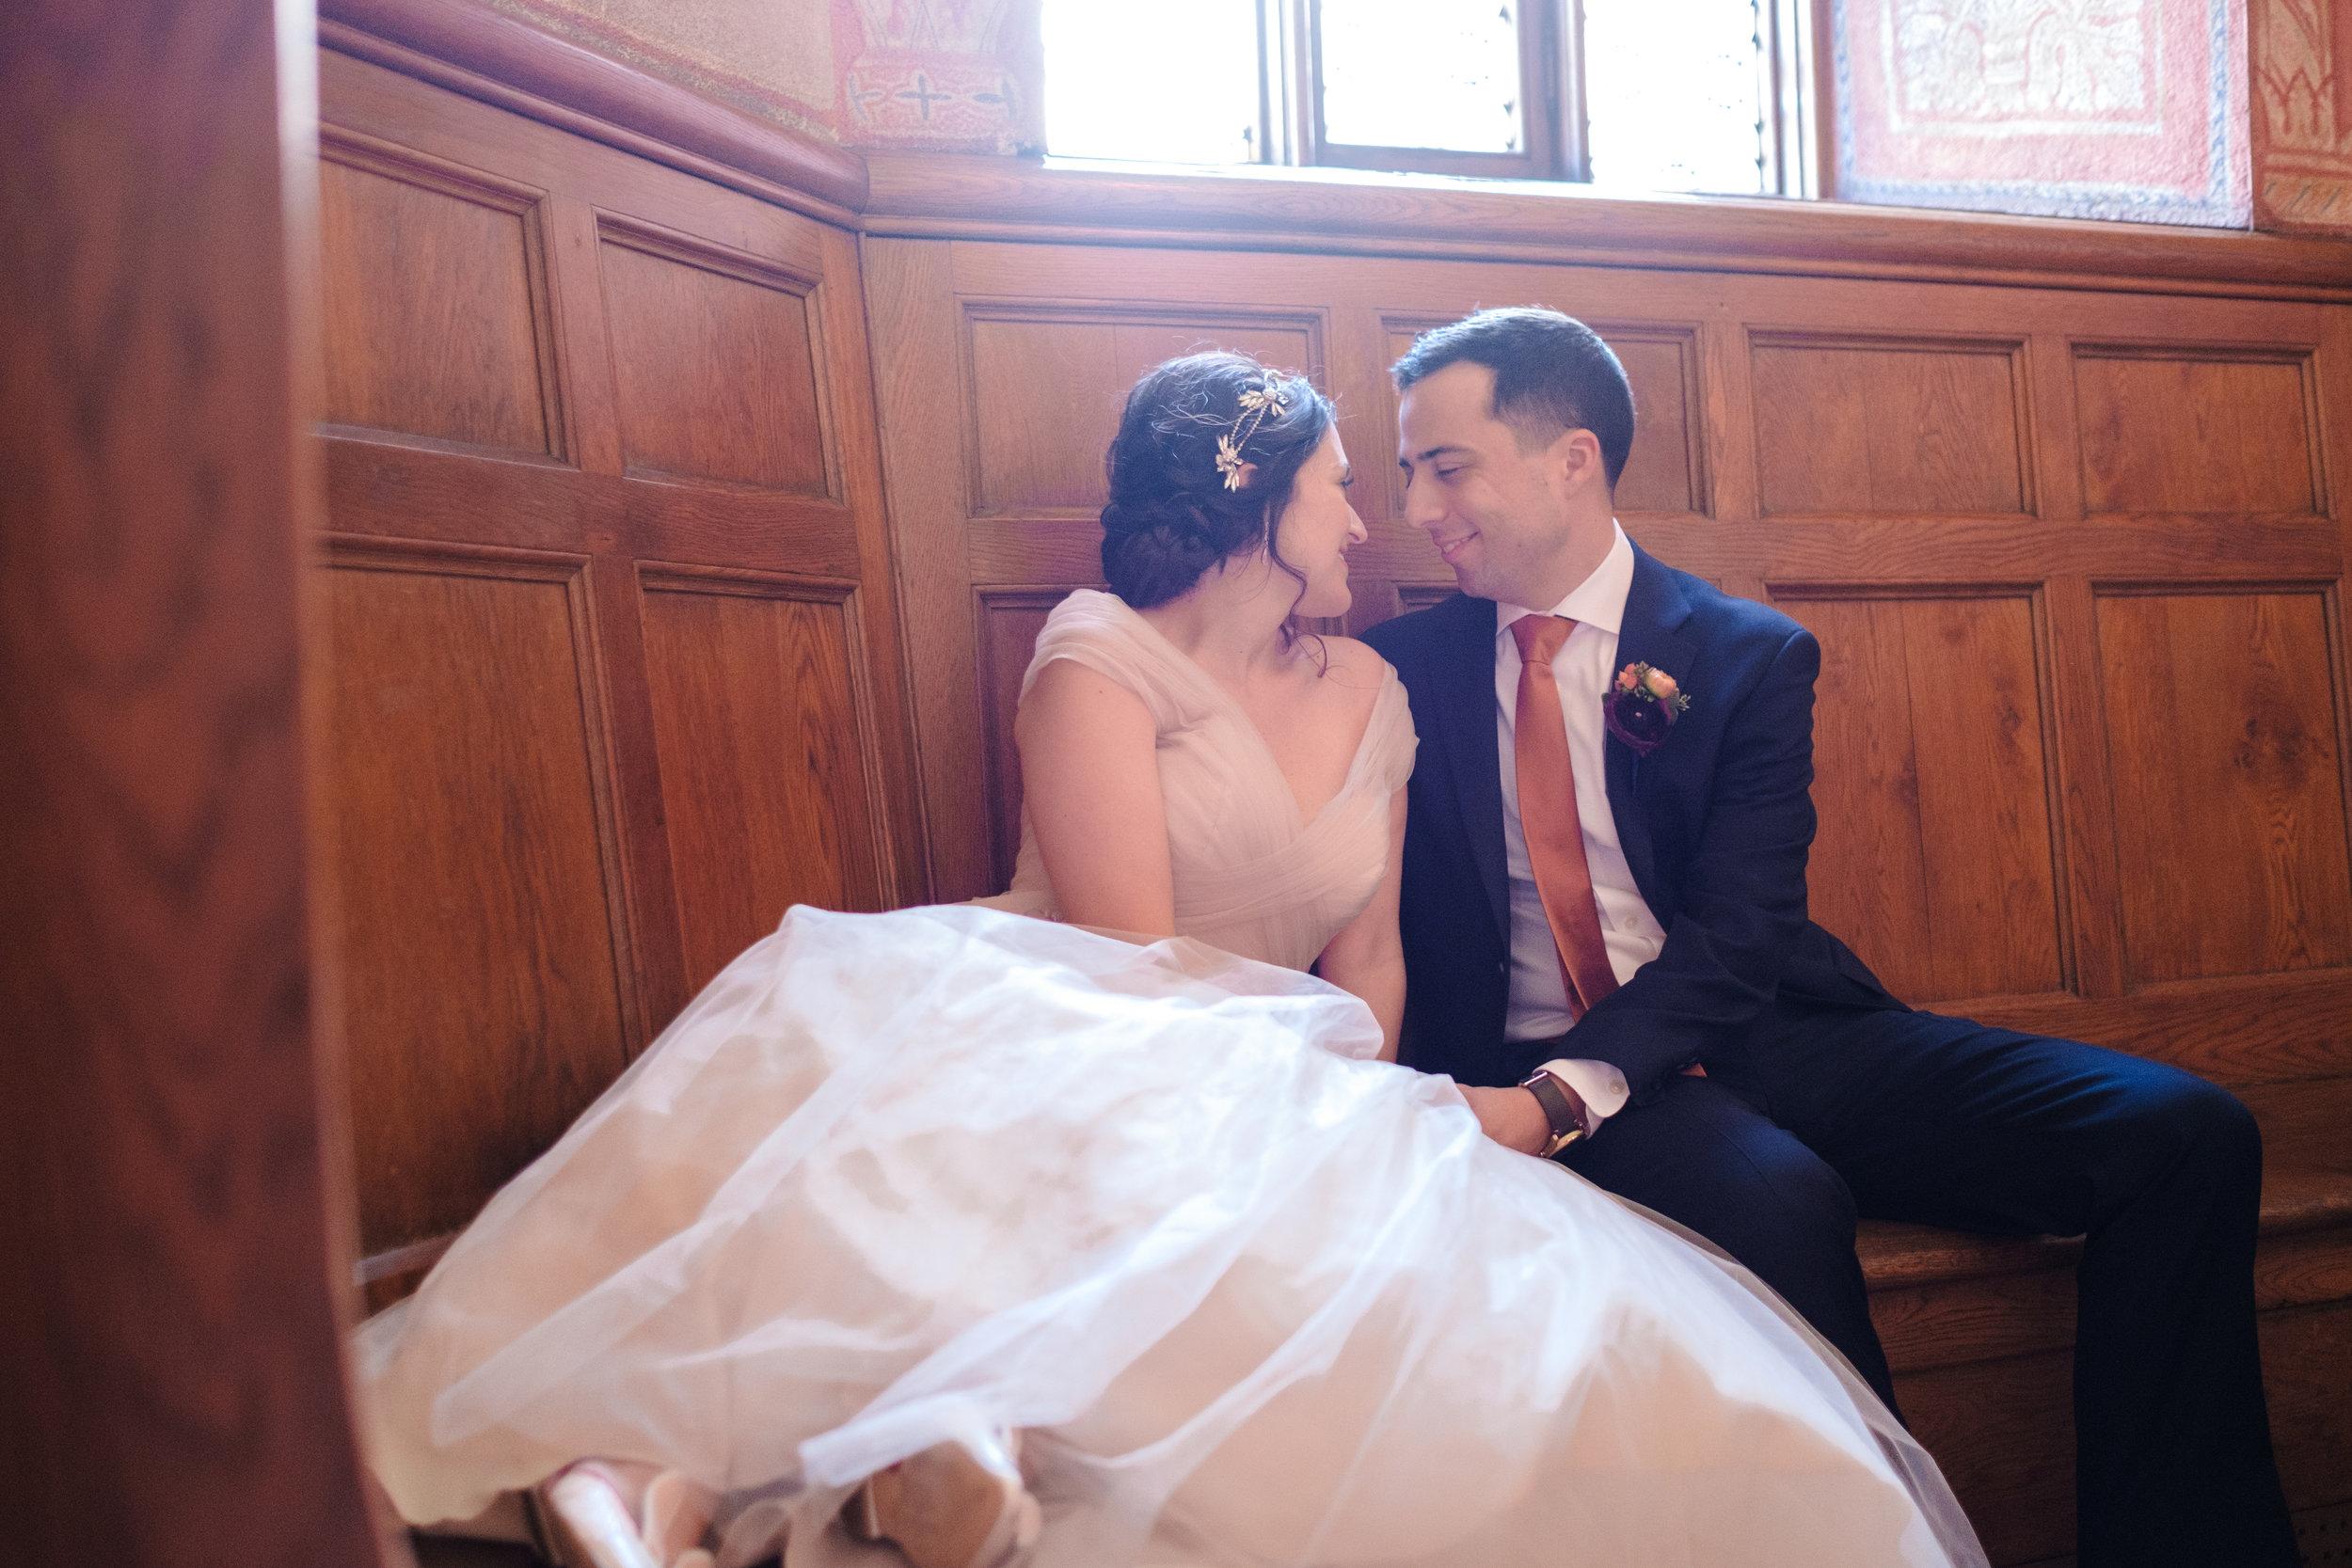 Elizabeth-Max-Pabst-Best-Place-Wedding-BAP-374.jpg